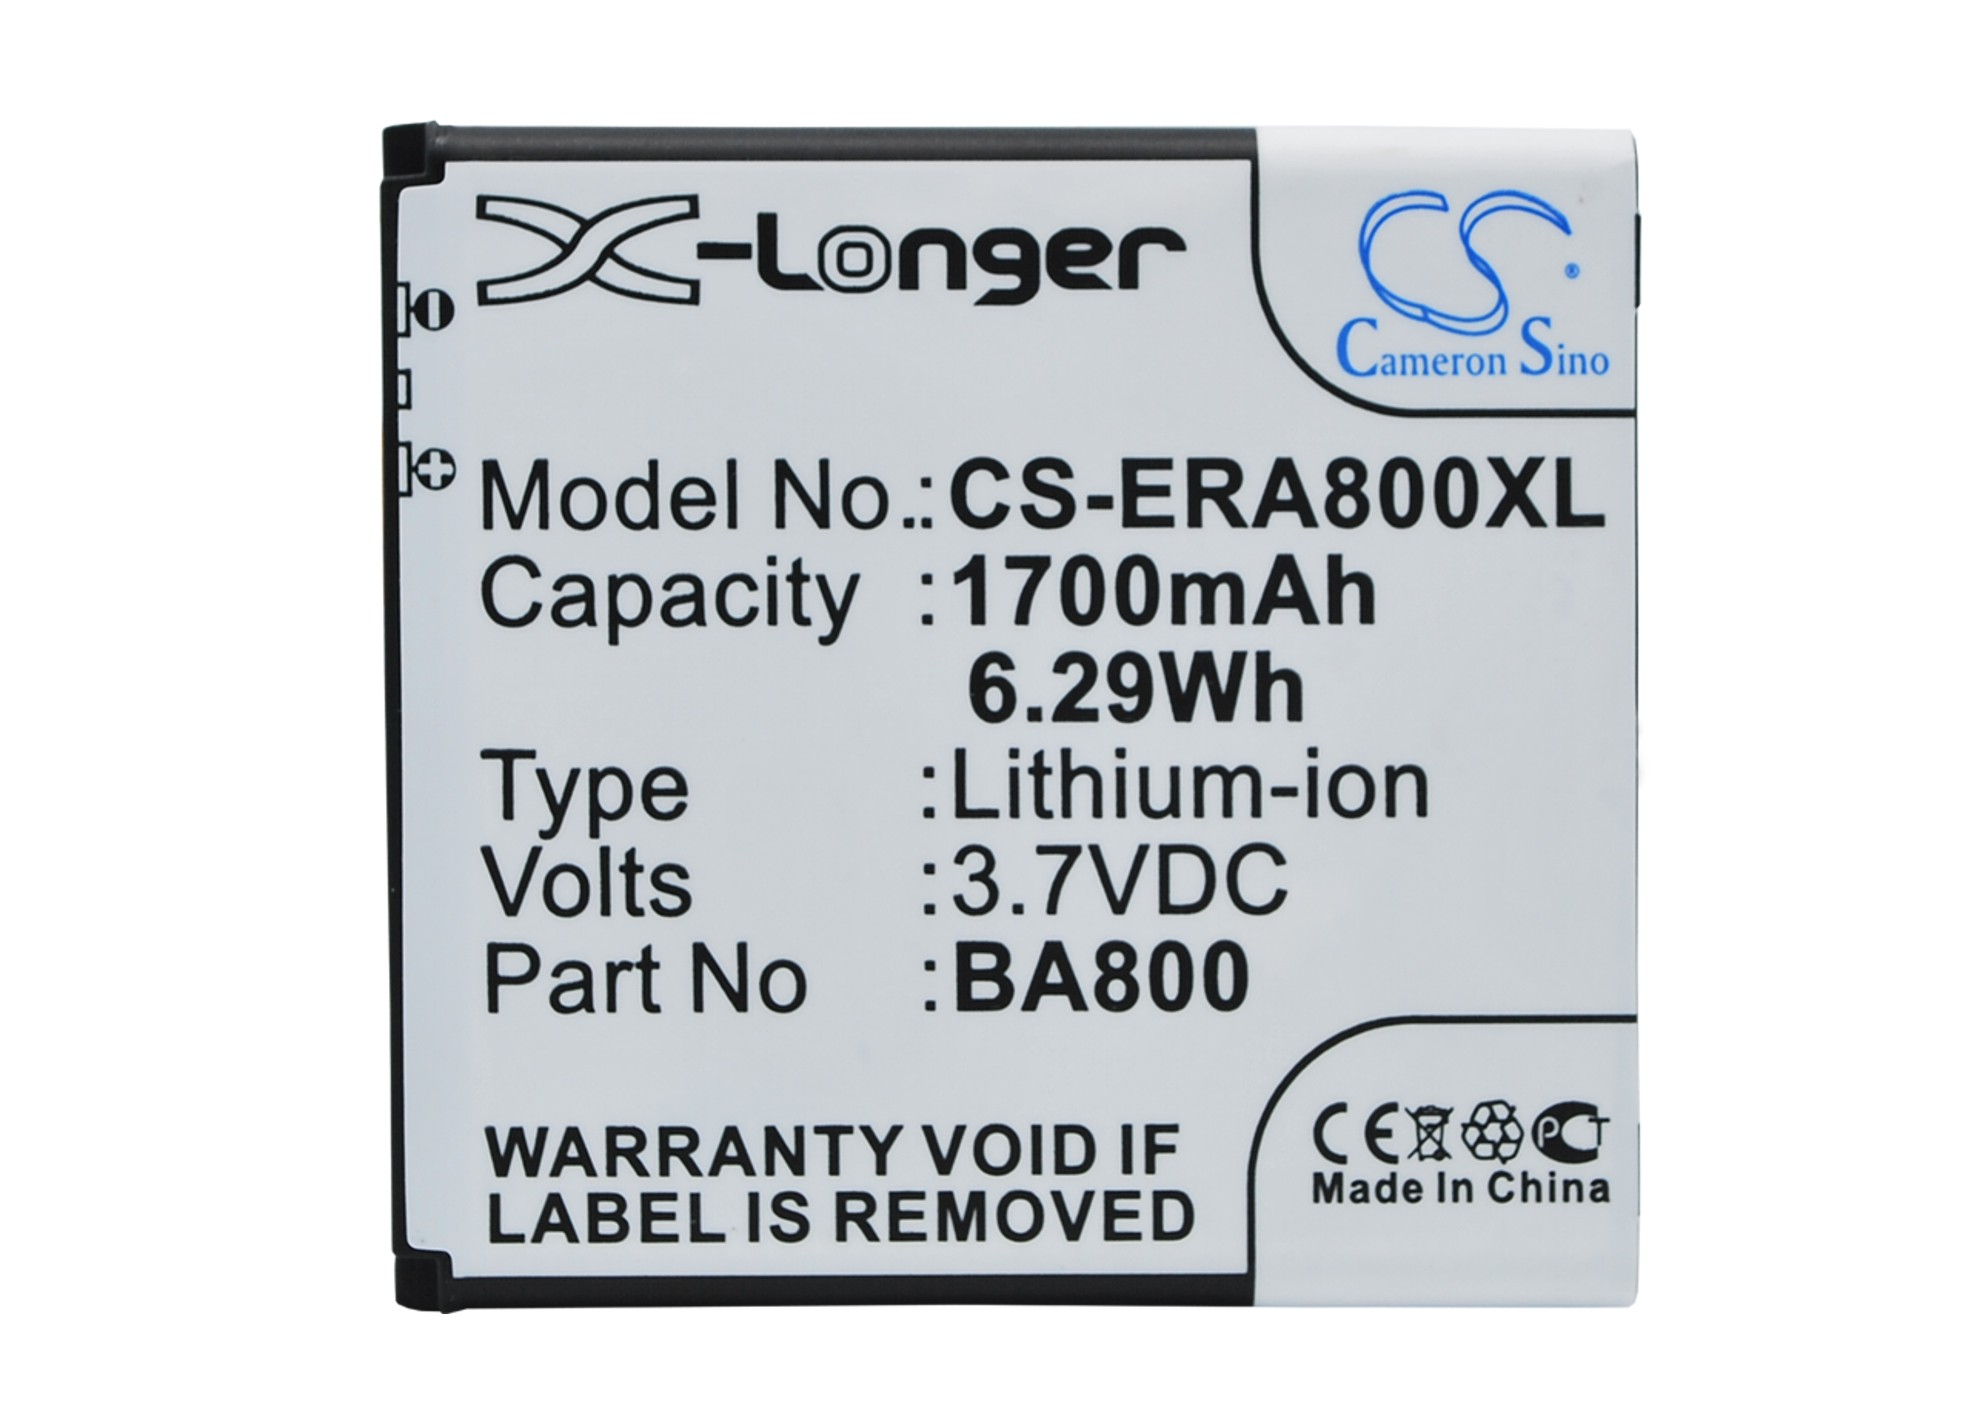 Cameron Sino 1700 mAh BA800 Bateria para Sony Ericsson Arc HD, Hikari, LT25C, LT26i, Nozomi, SO-01E, Tsubasa Xin, Xperia Arc S, Xperia AX